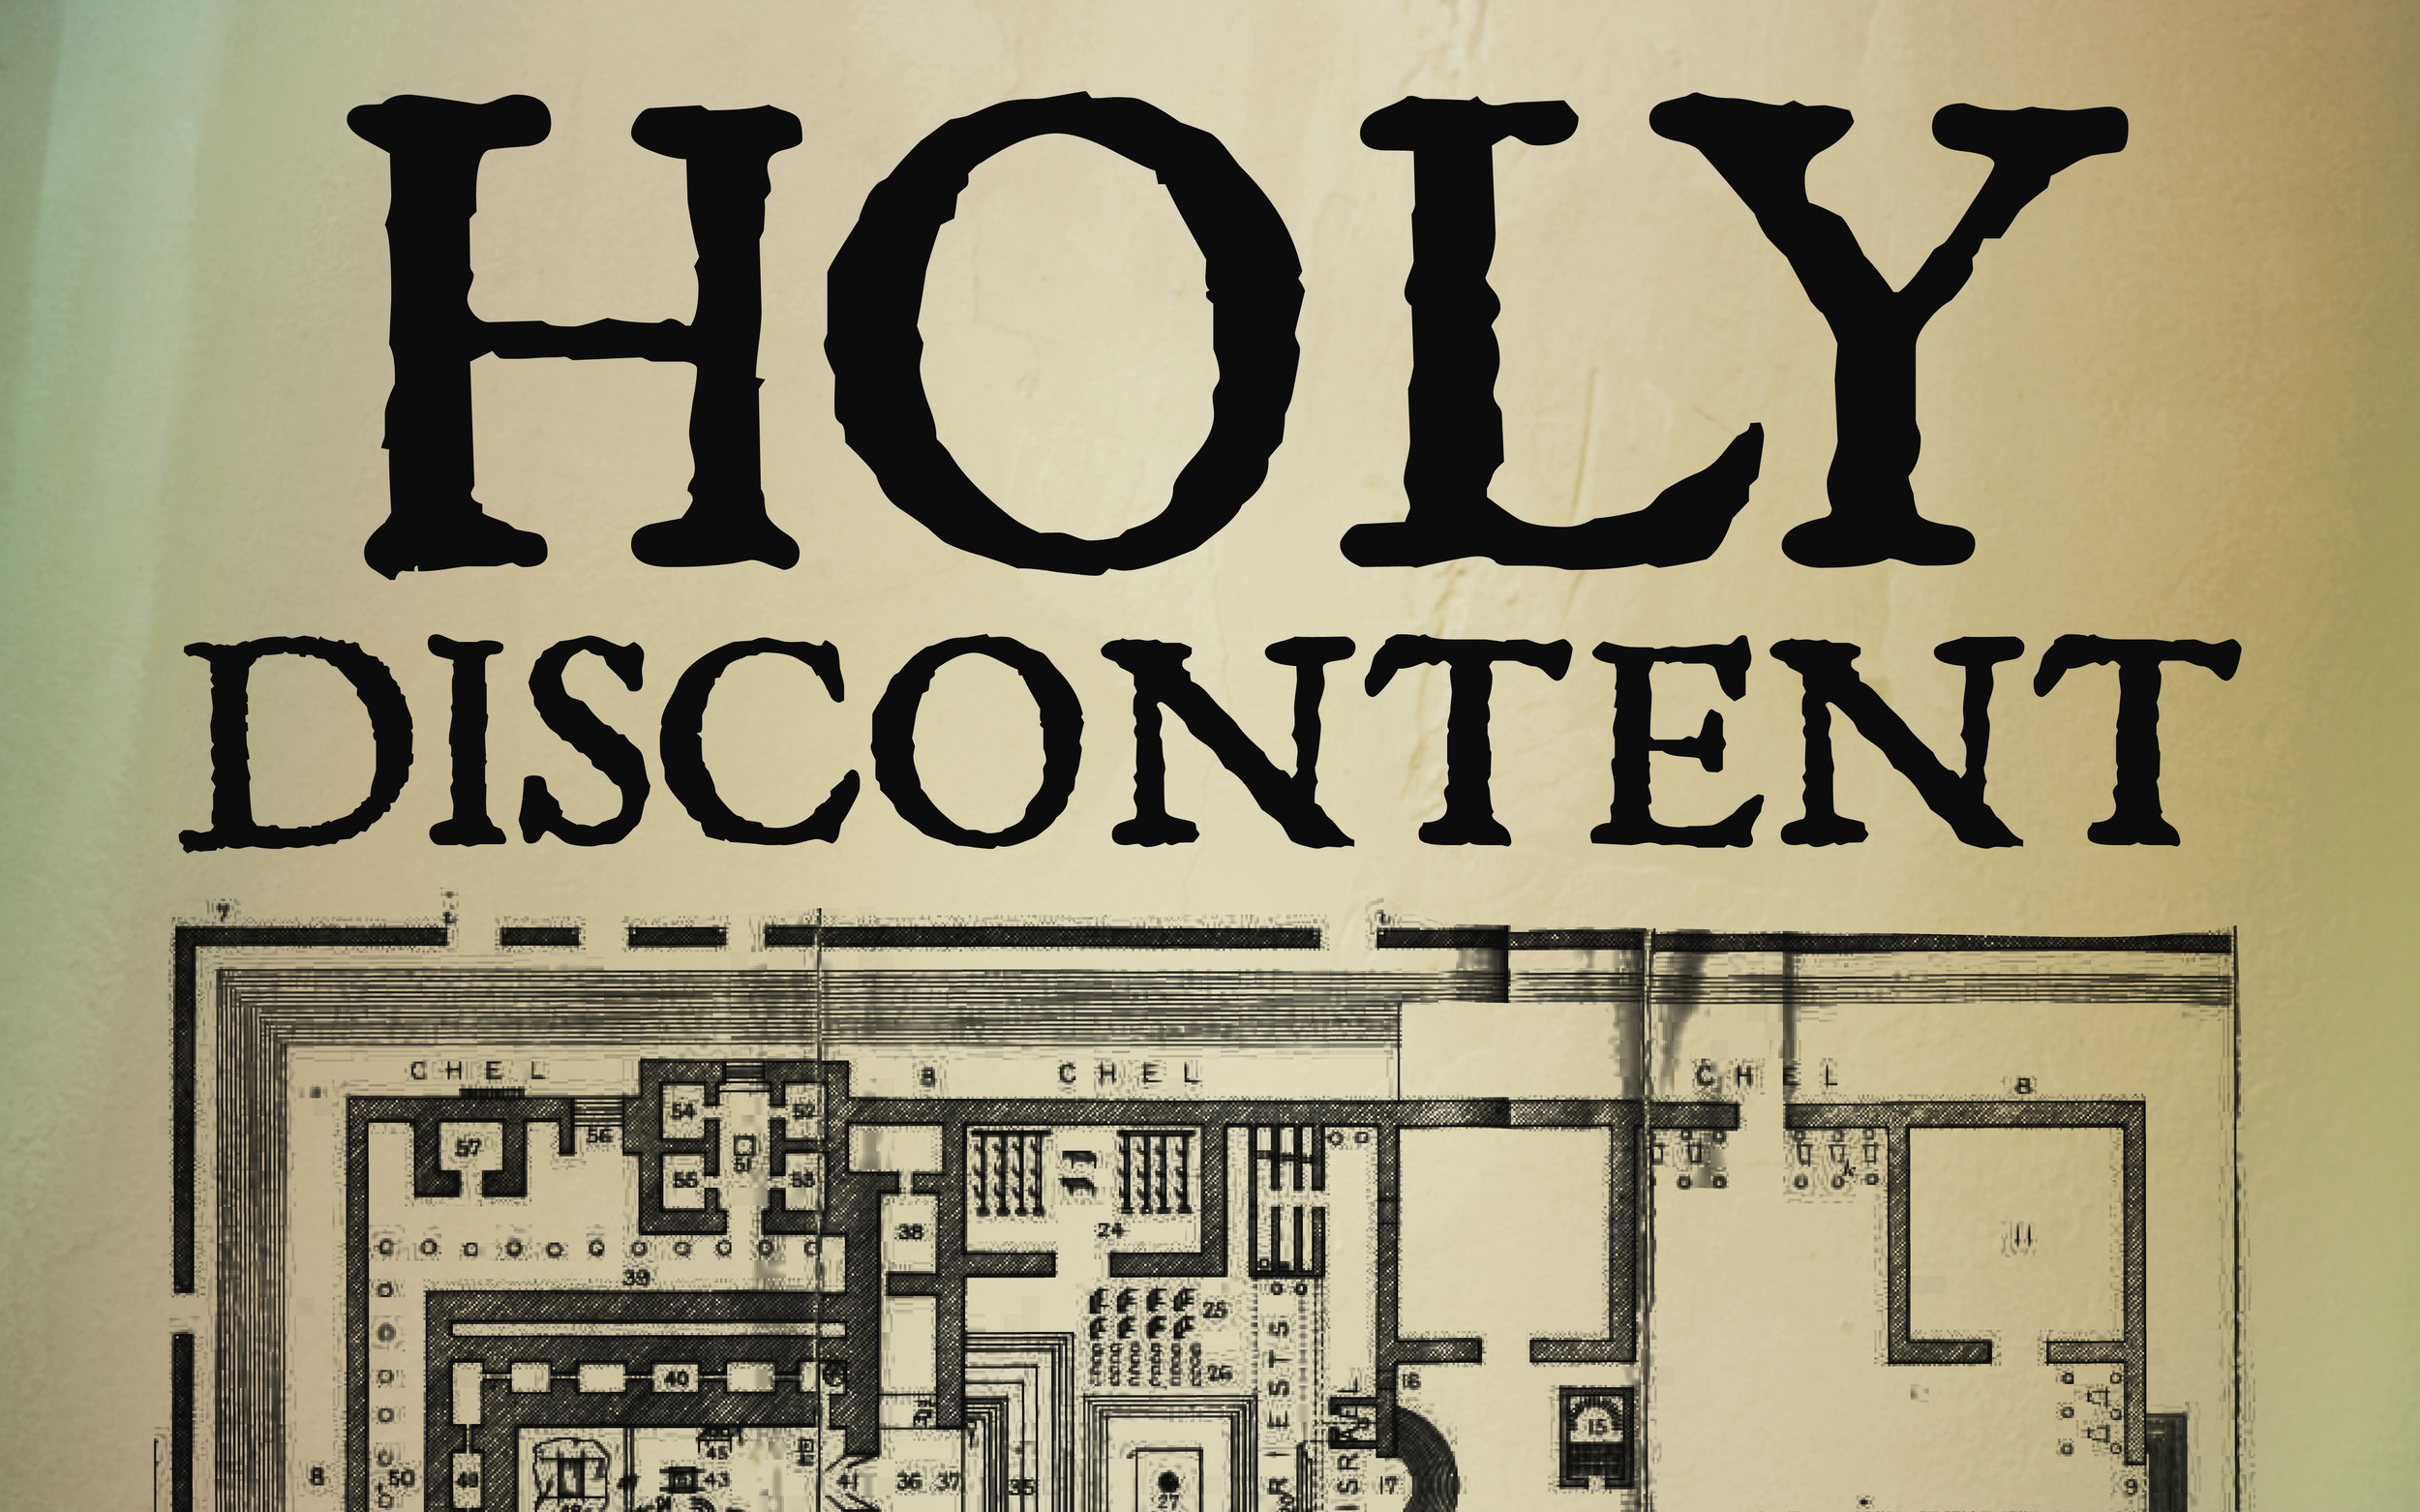 HolyDiscontent4-03 (1).jpg